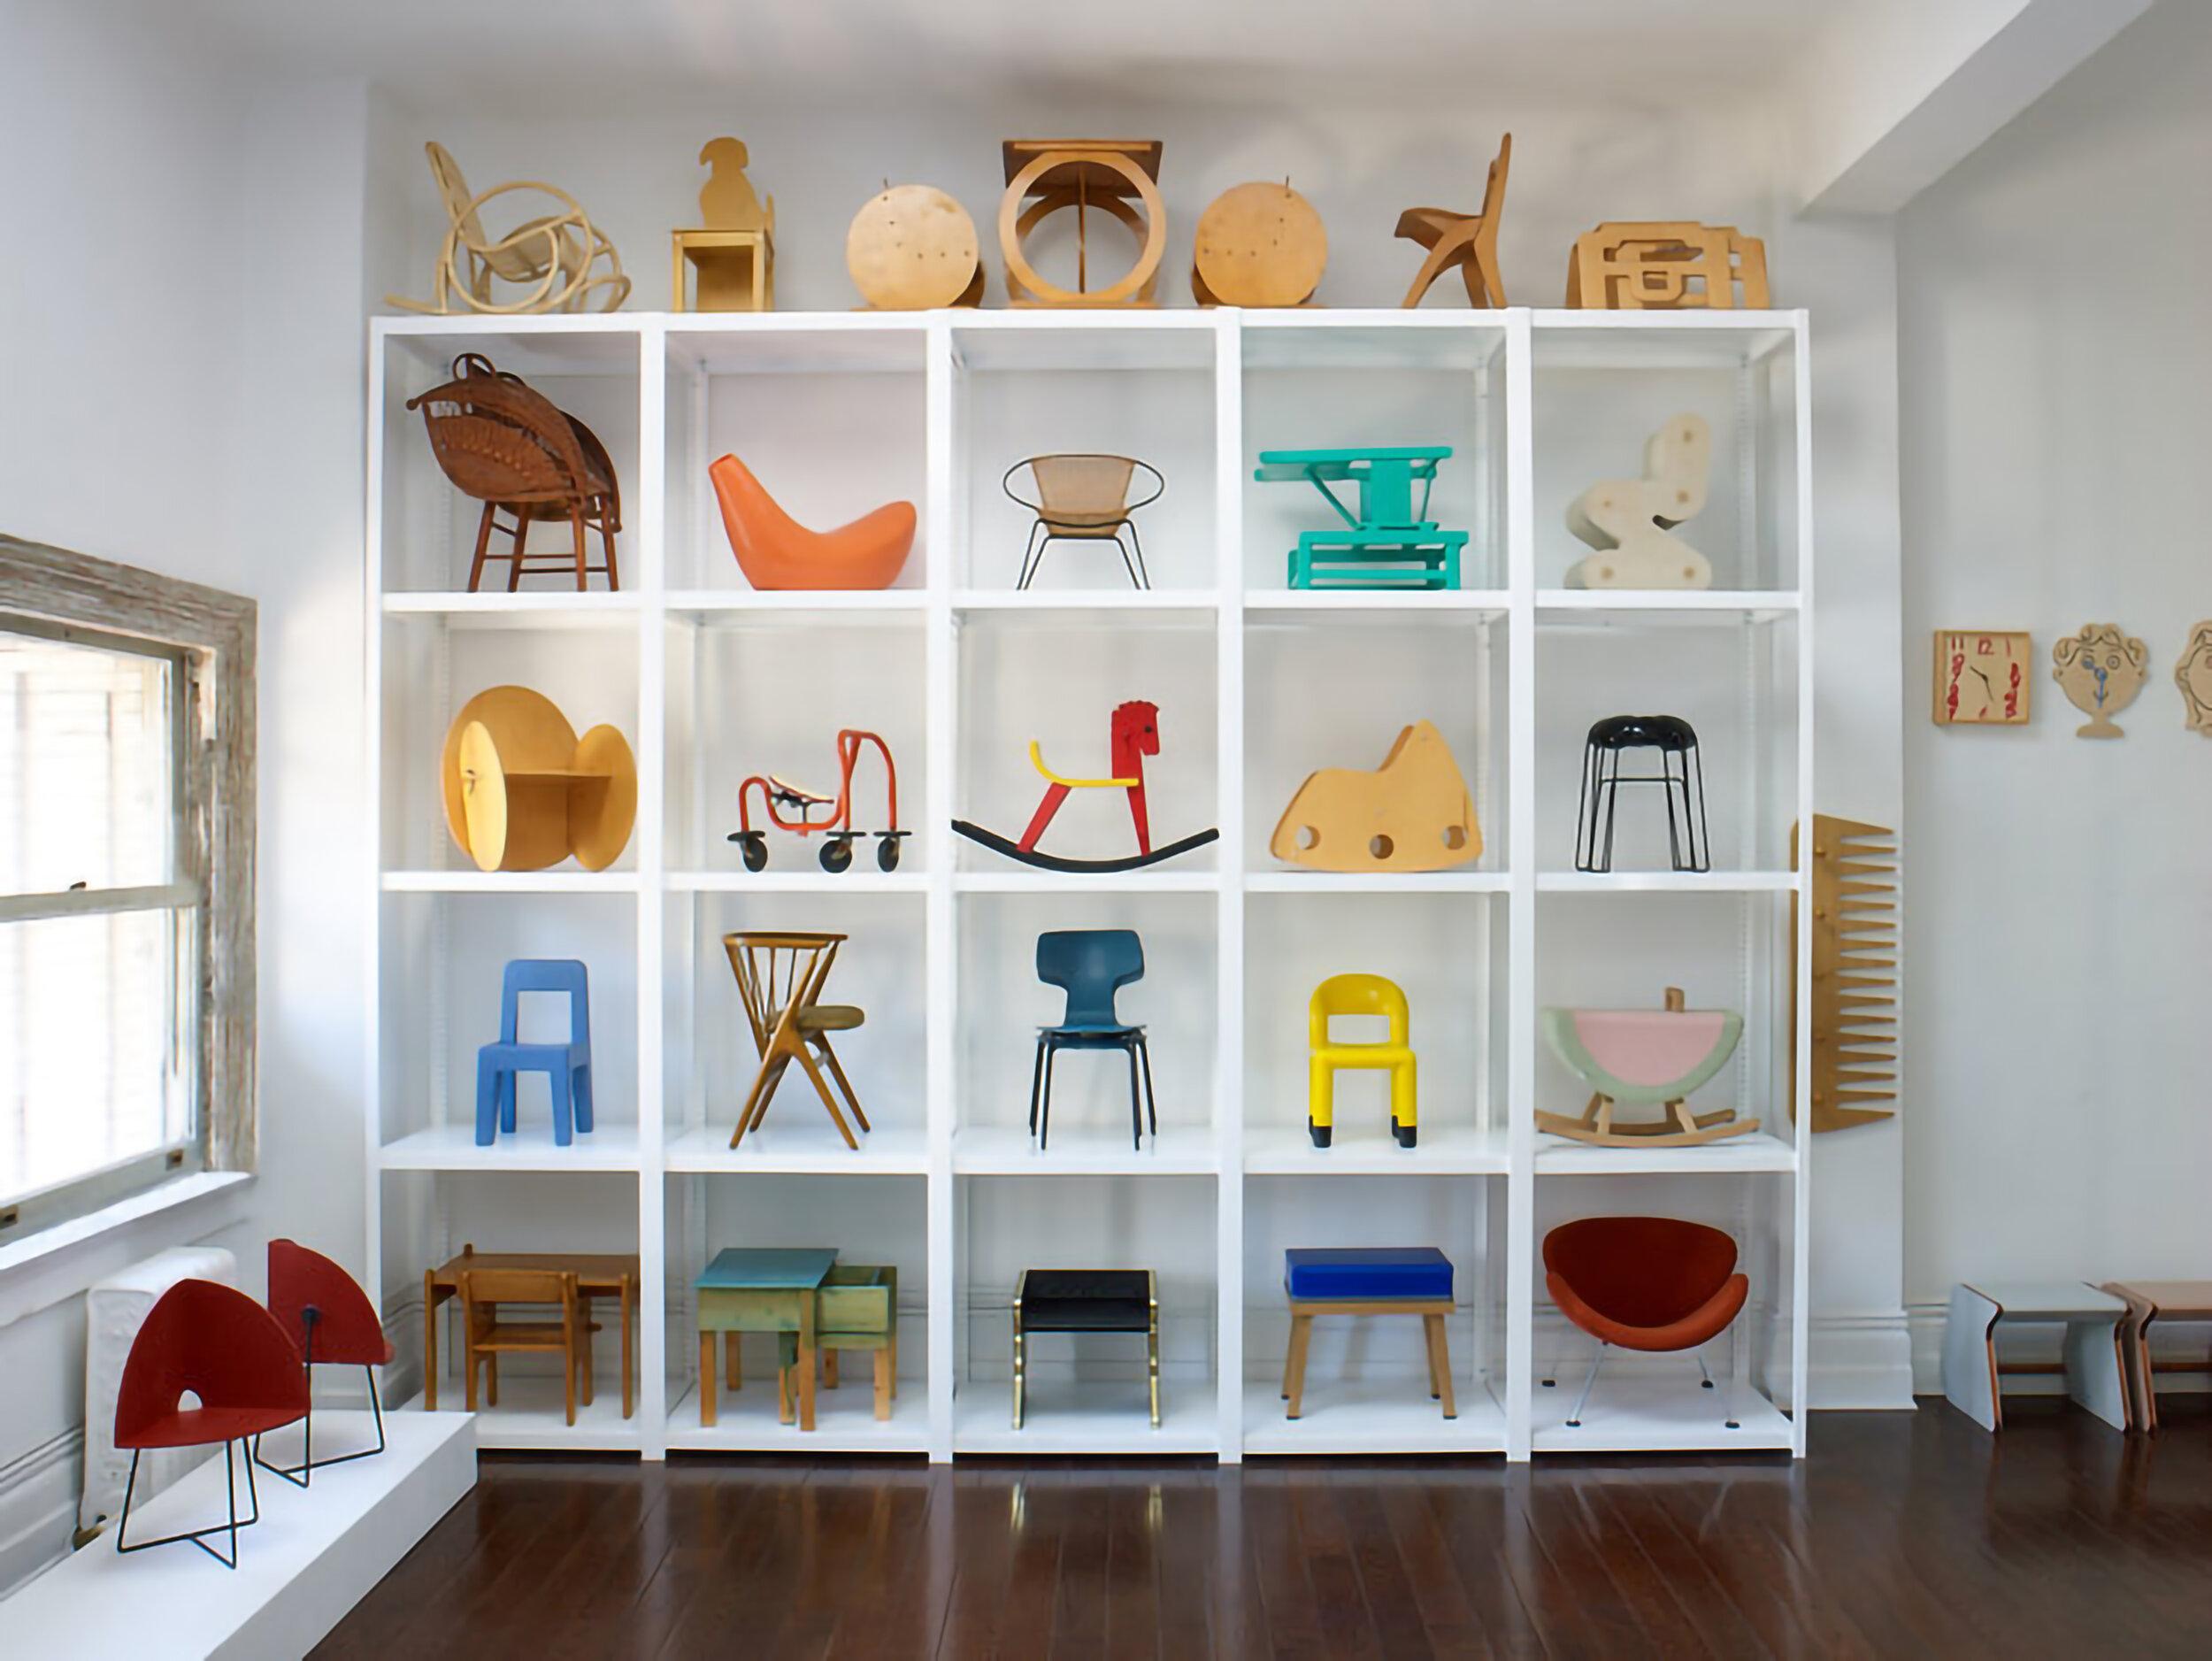 kinder MODERN Gallery, photo credit: Alexandra Rowley